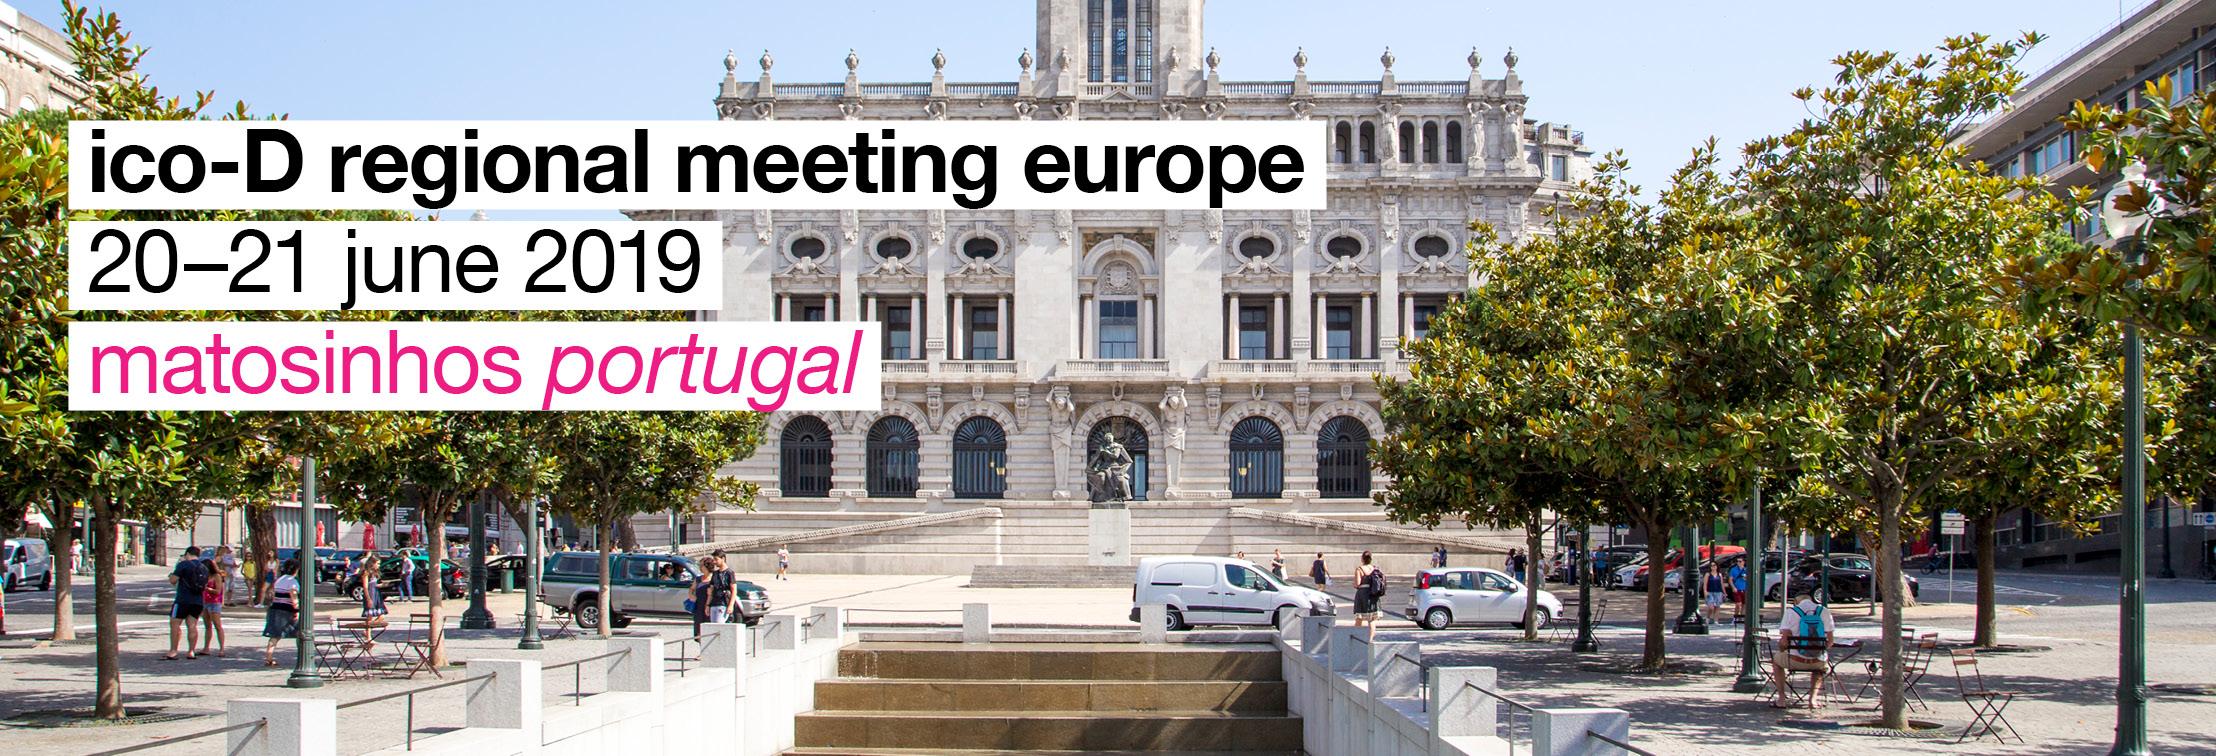 ico-D Regional Meeting Porto